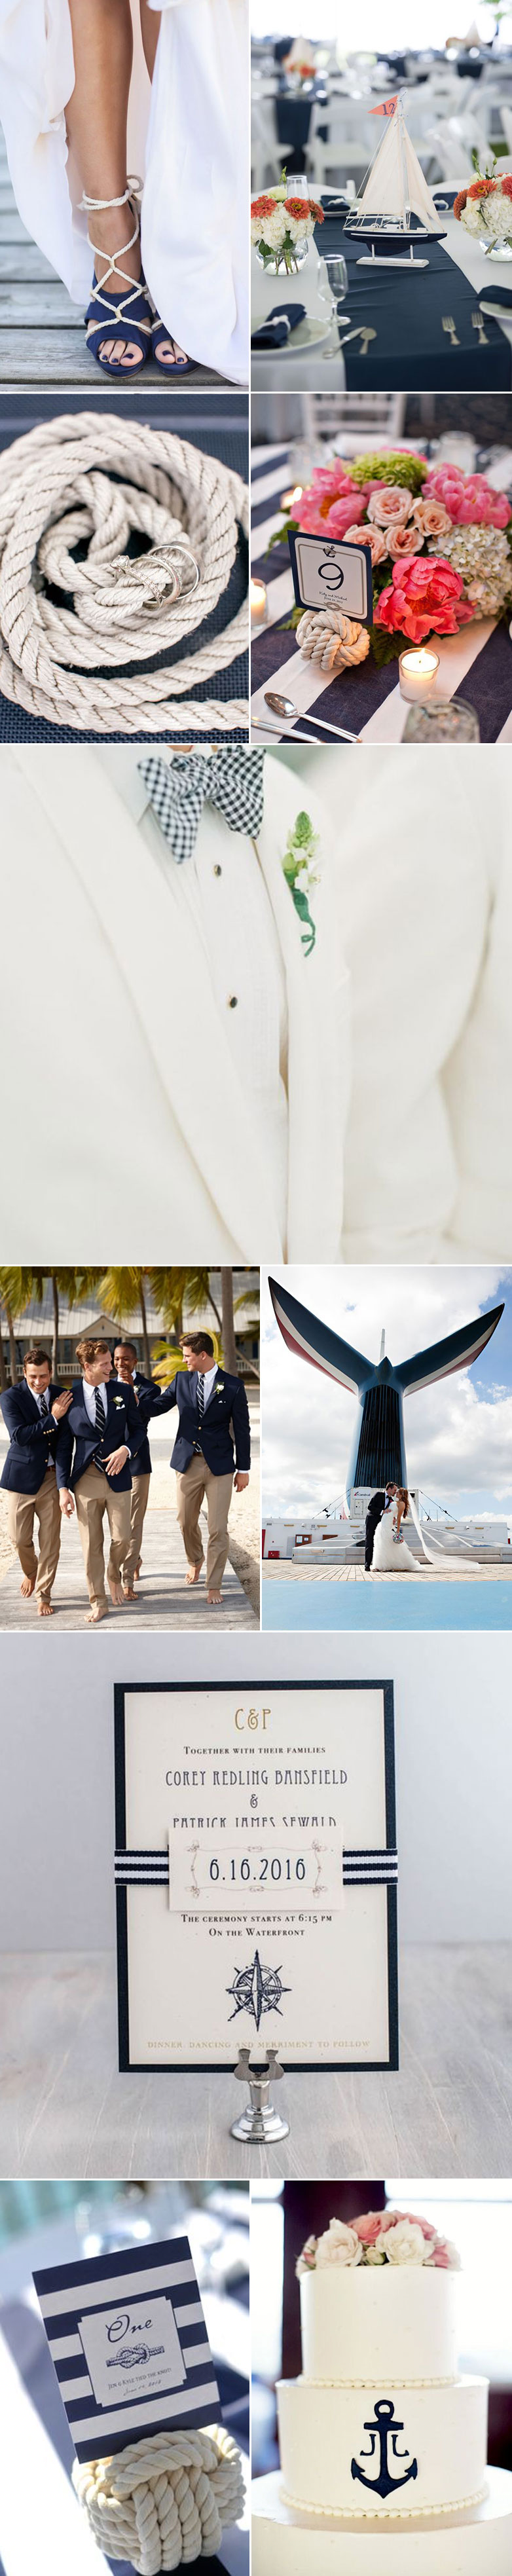 Nautical wedding inspiration bows n ties nautical wedding ideas junglespirit Images